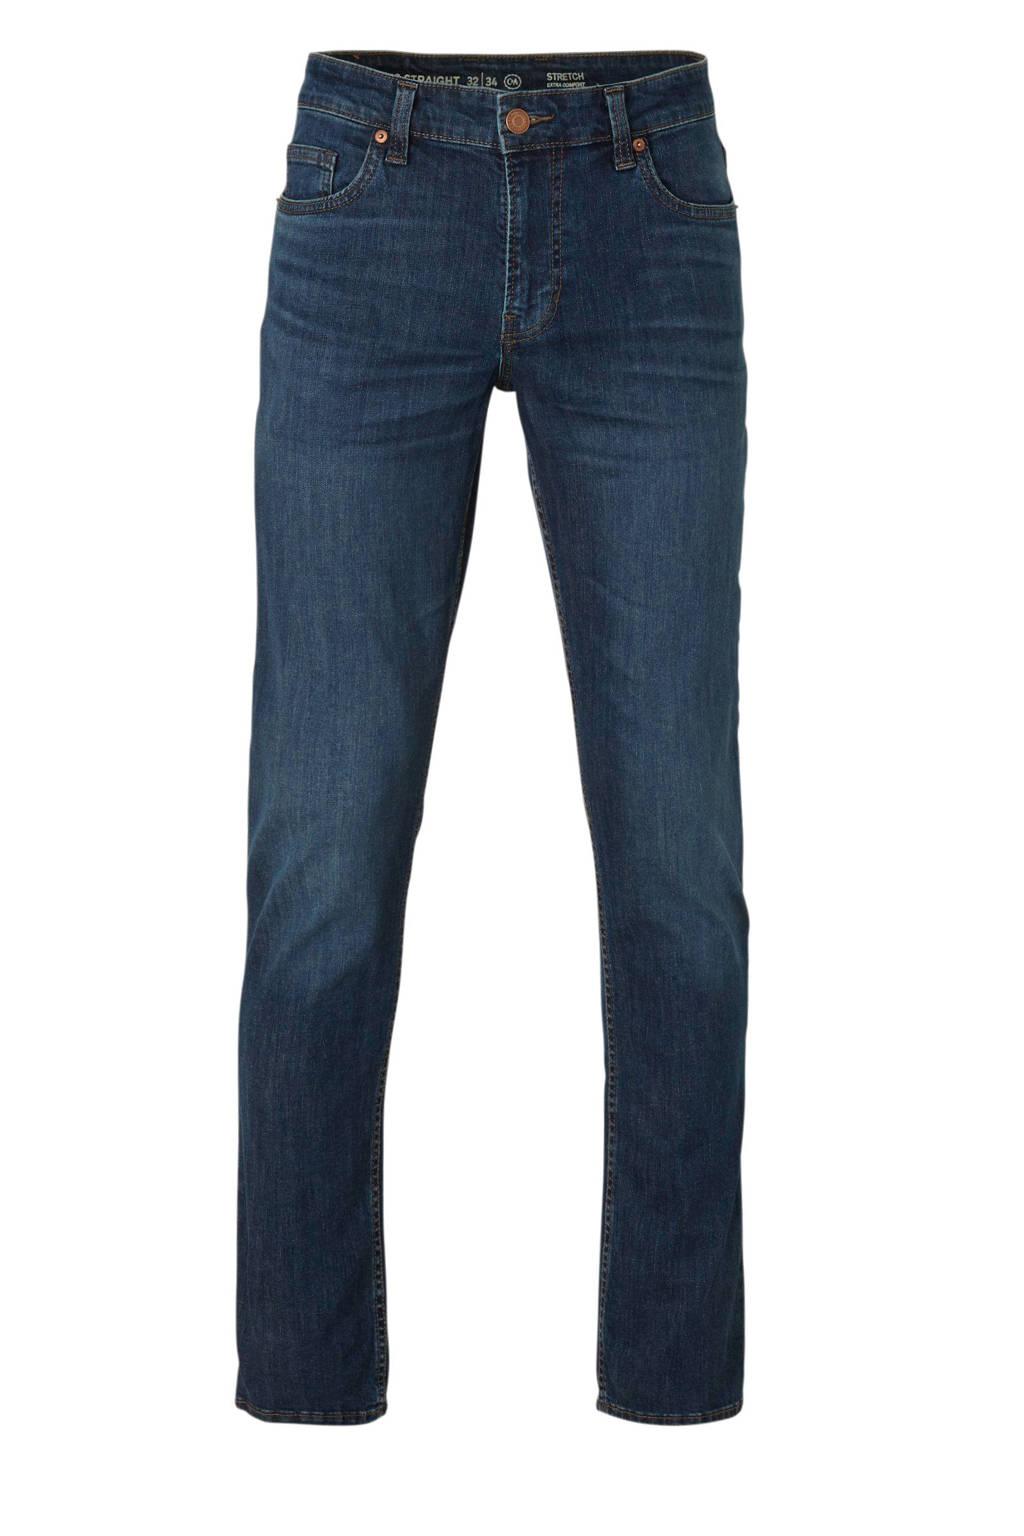 C&A The Denim straight fit jeans dark denim, Dark denim